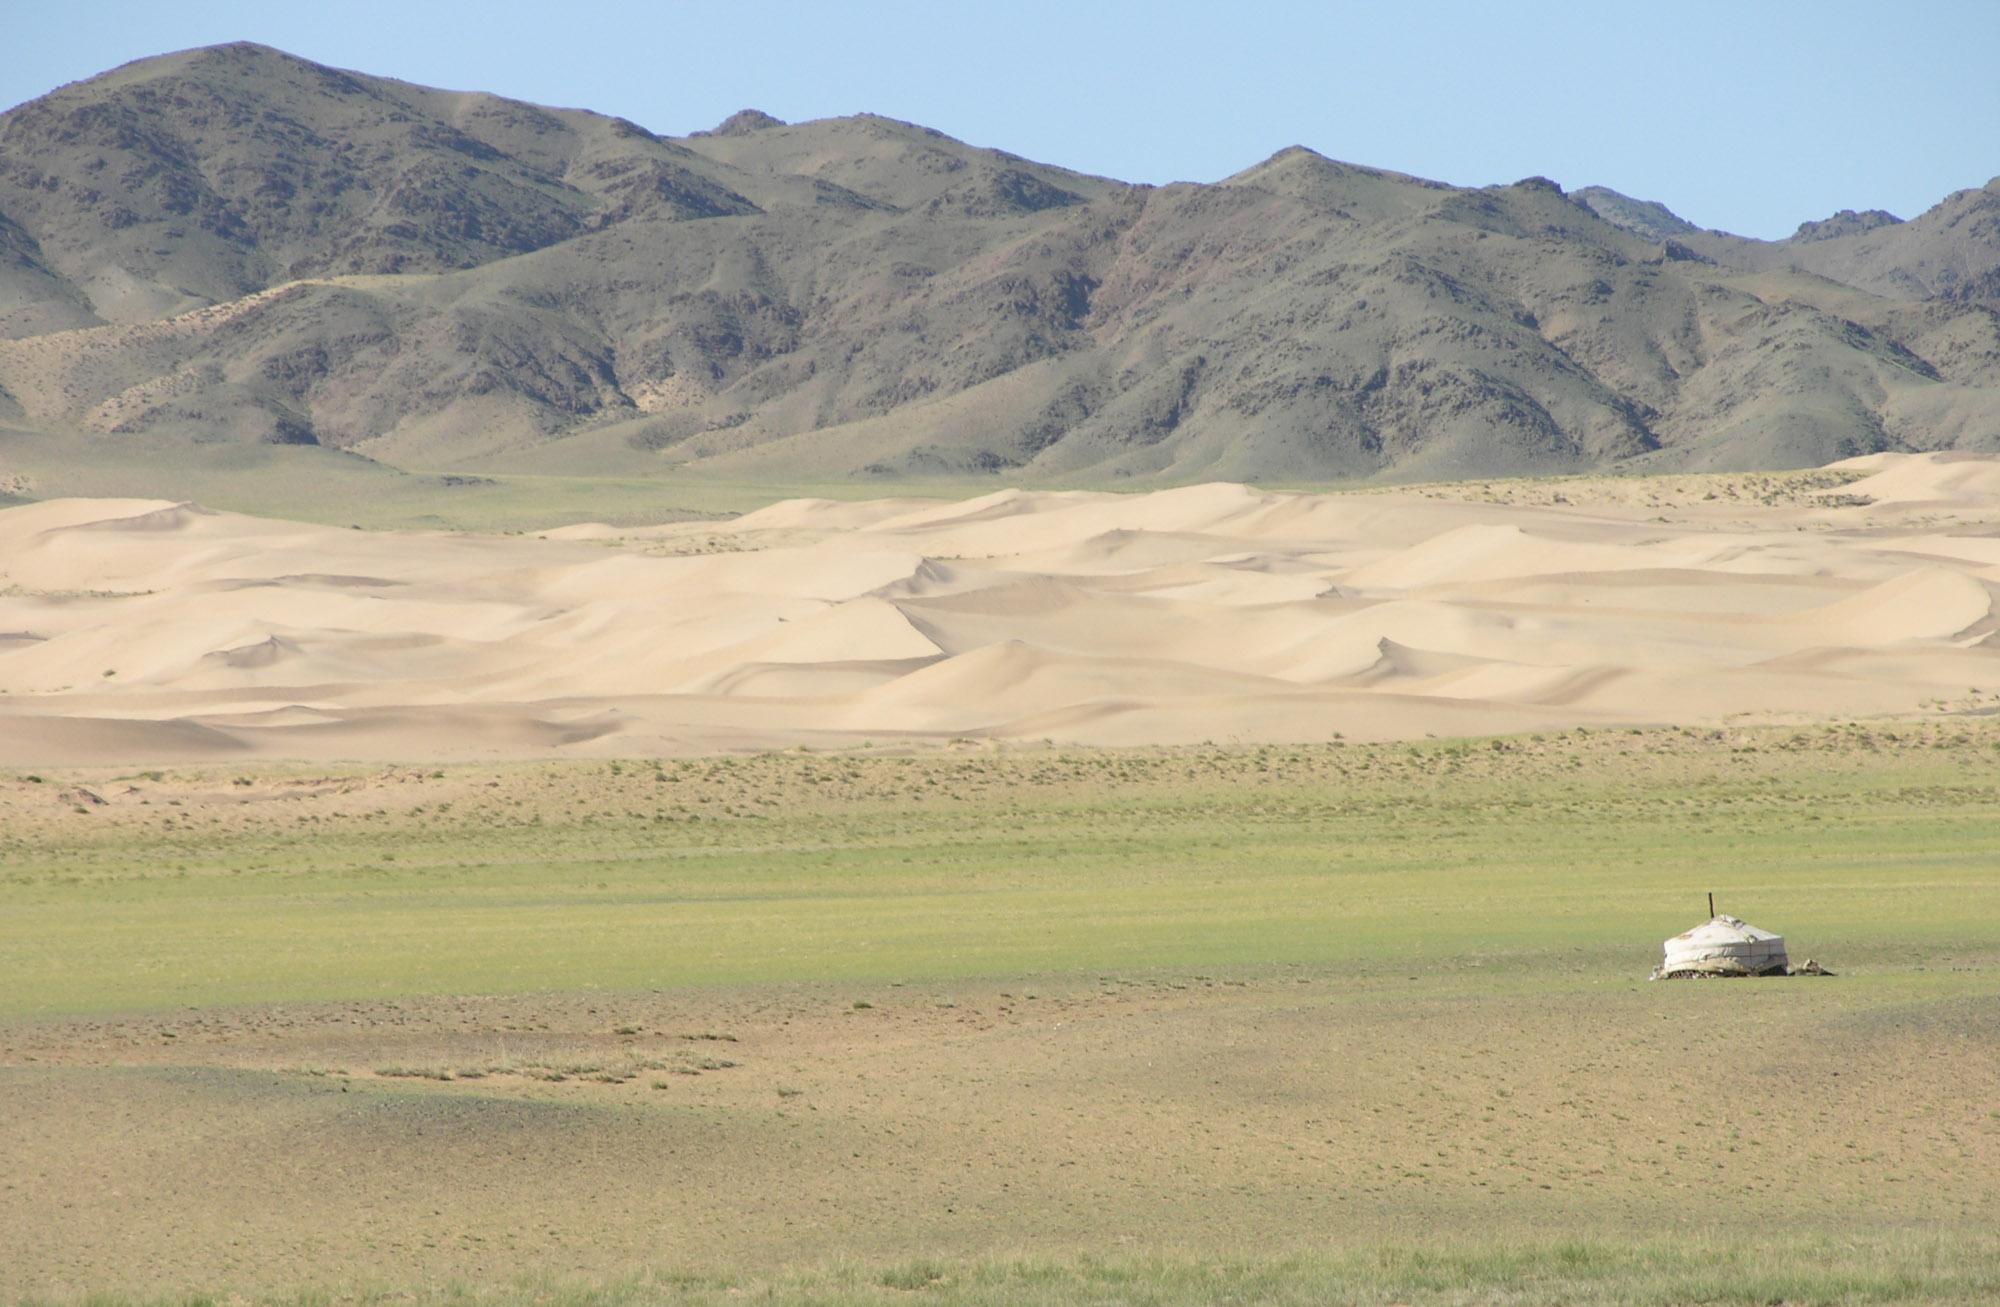 Ecotourisme-voyages-alternatifs-Mongolie-Immersion-12.jpg